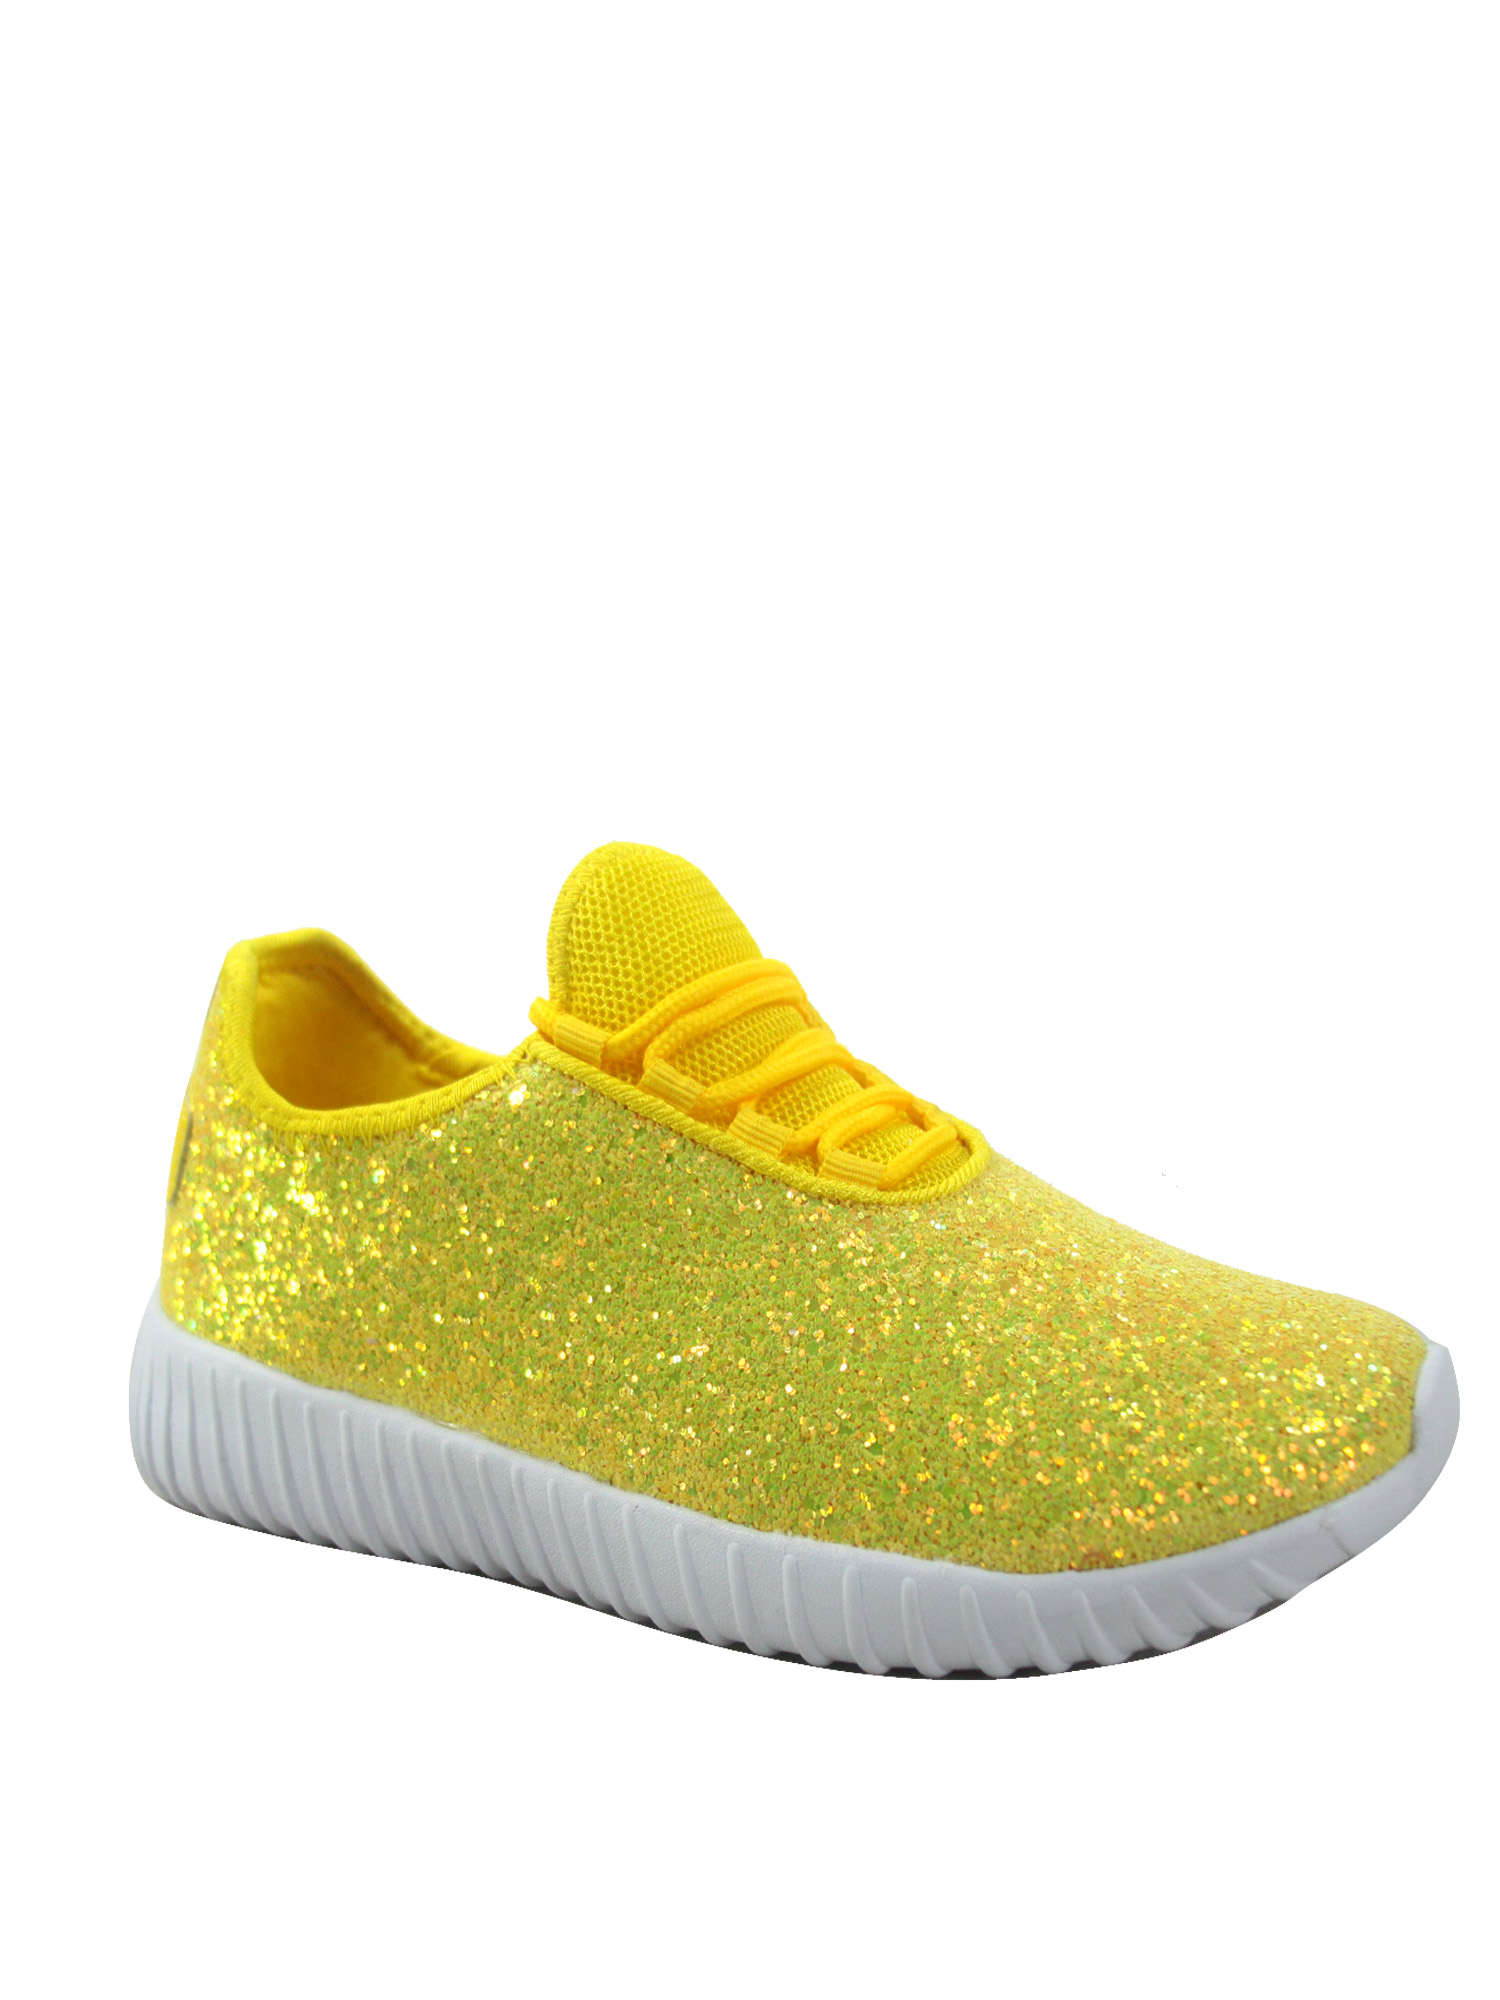 White Girls Sneakers \u0026 Athletic